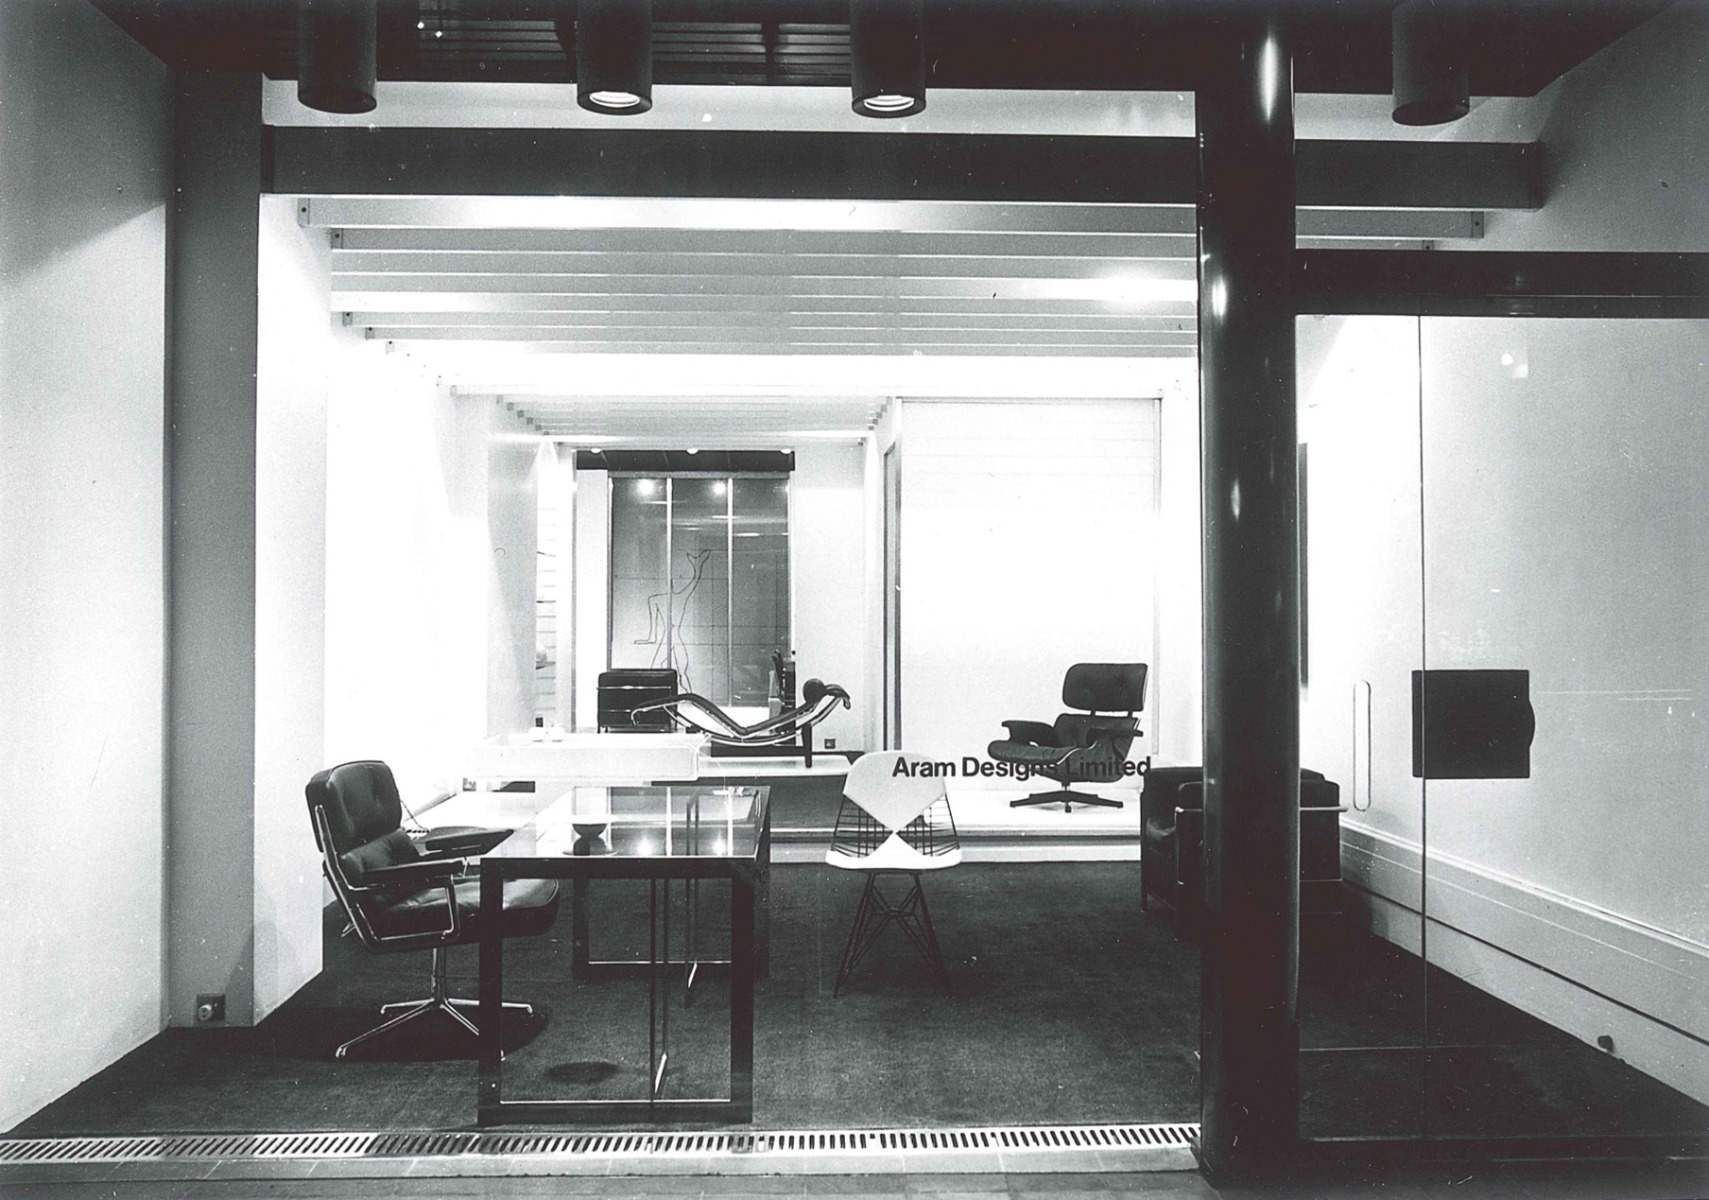 Aram Designs Limited - Showroom, Kings Road, London, 1964